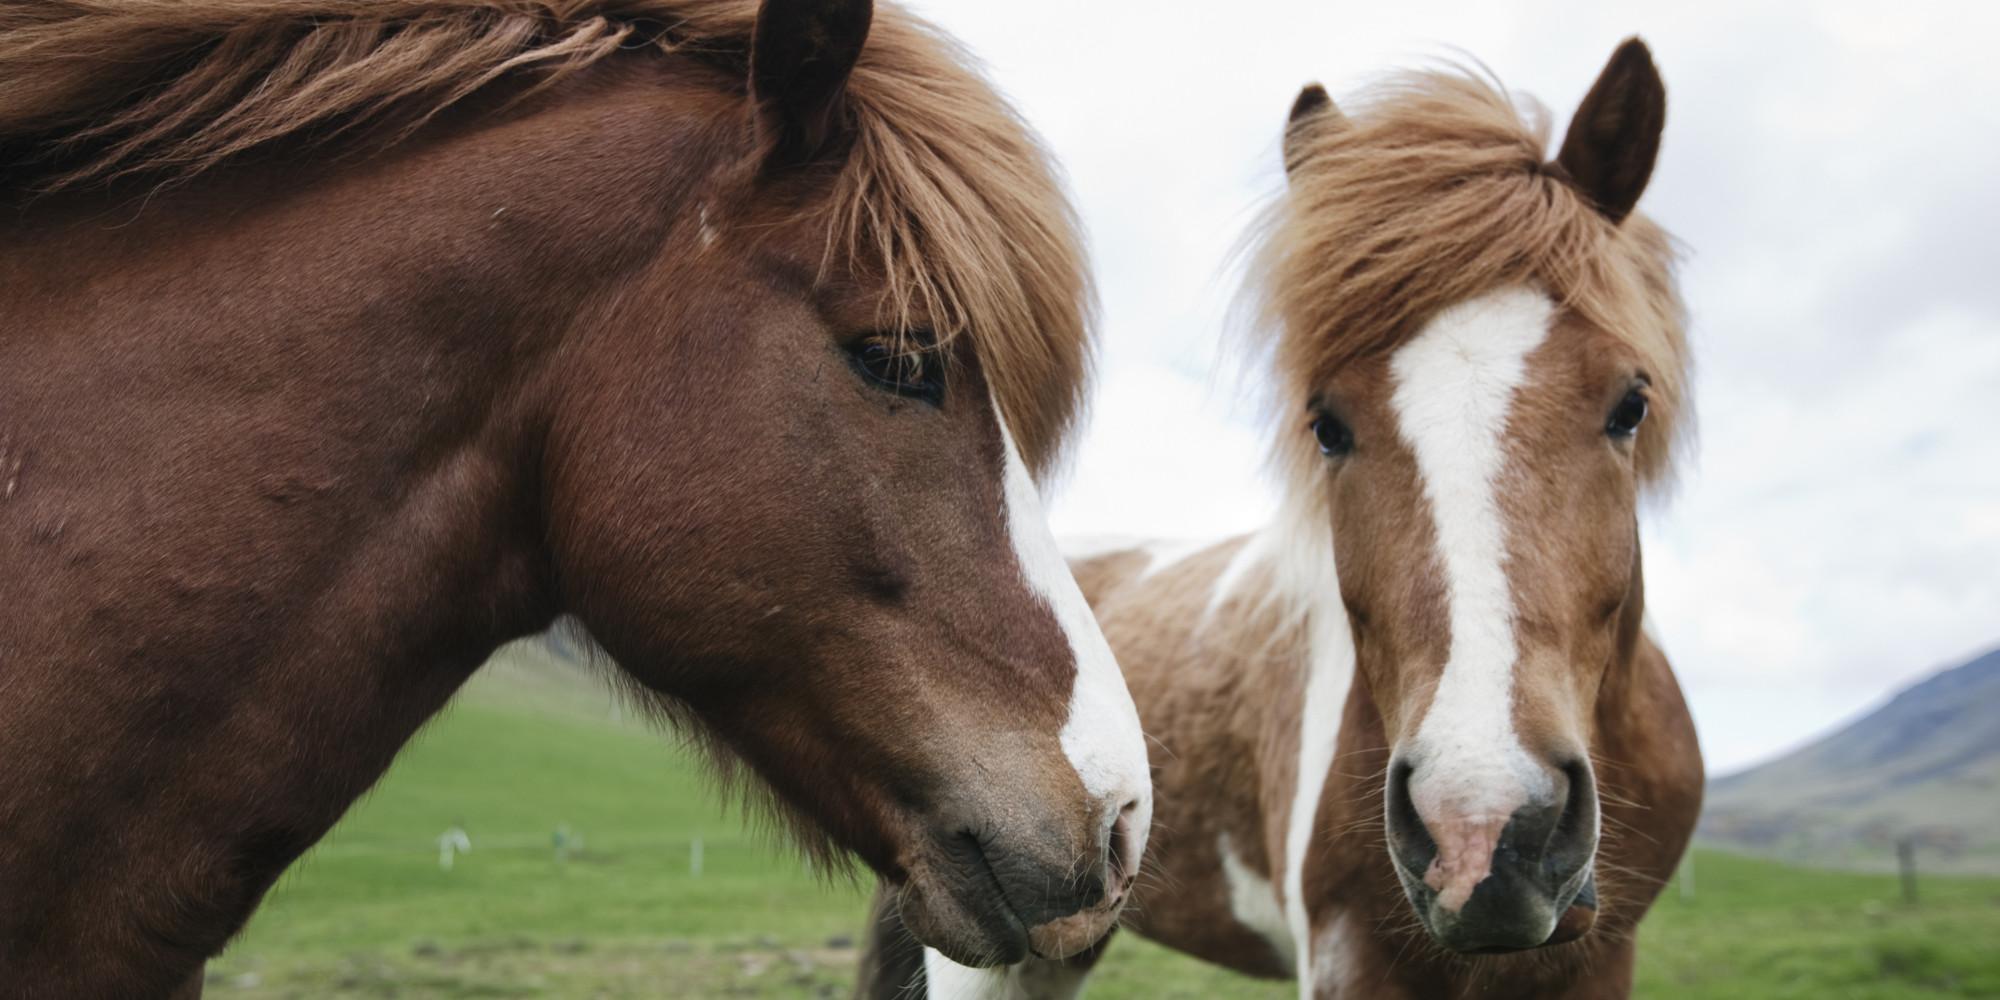 Behavior Similarities Among Wild vs. Domestic Horses